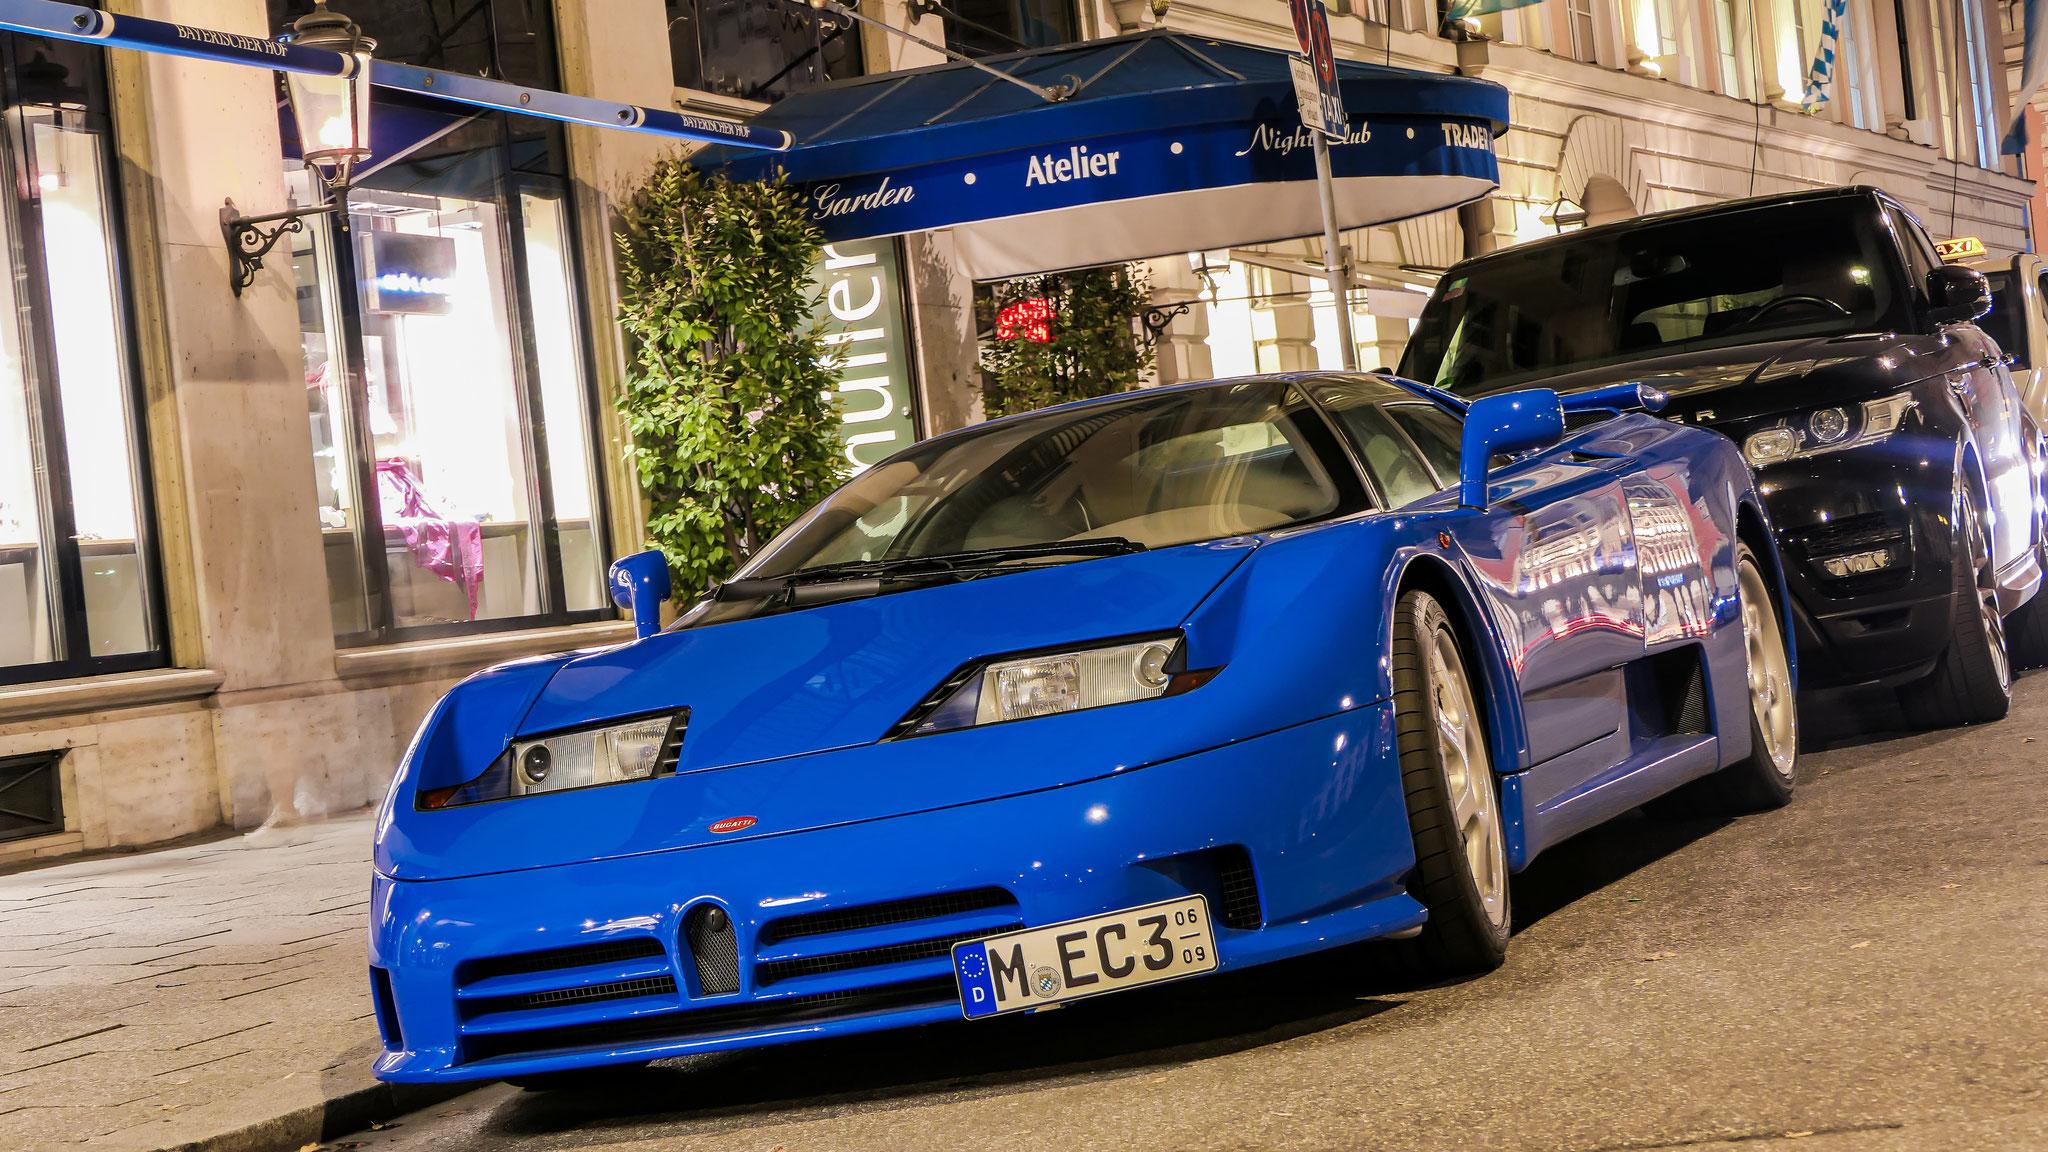 Bugatti EB110 - M-EC-3